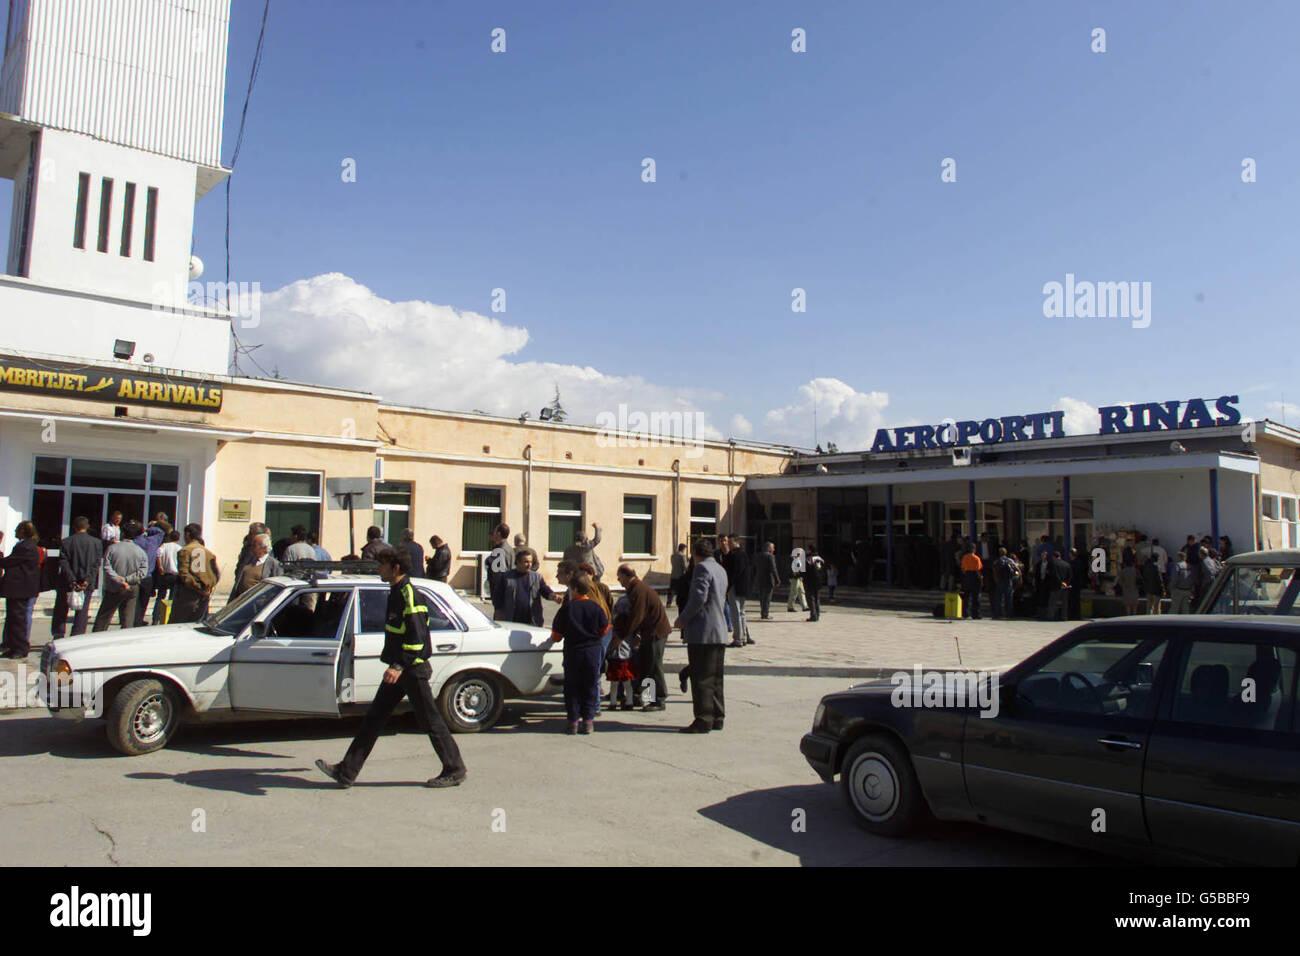 Albanian Airport - Stock Image